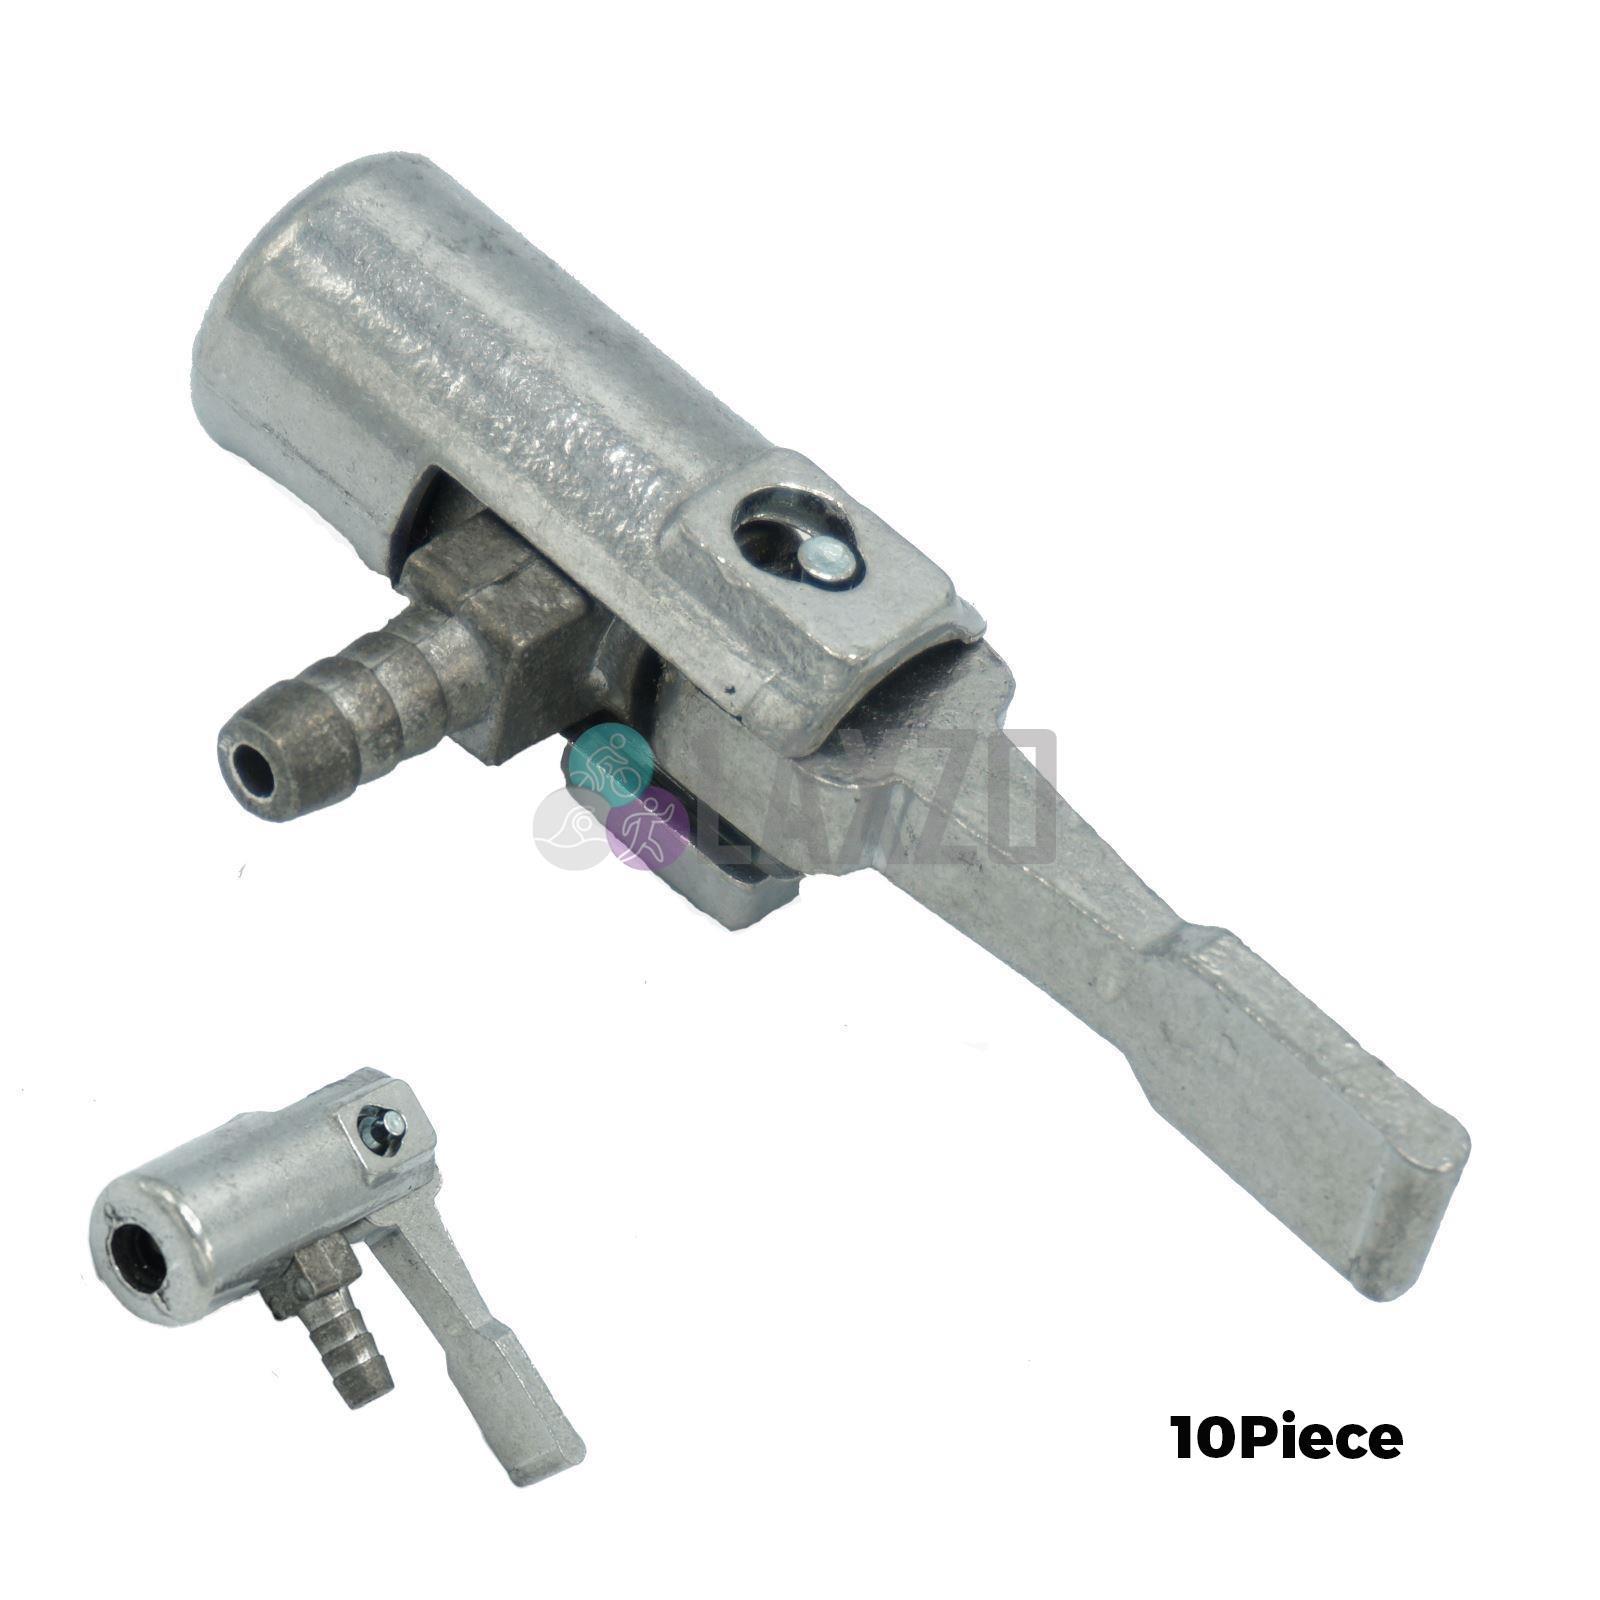 Replacement Bicycle Bike Tyre Tube Universal Valve Adaptor Head for Floor Pump